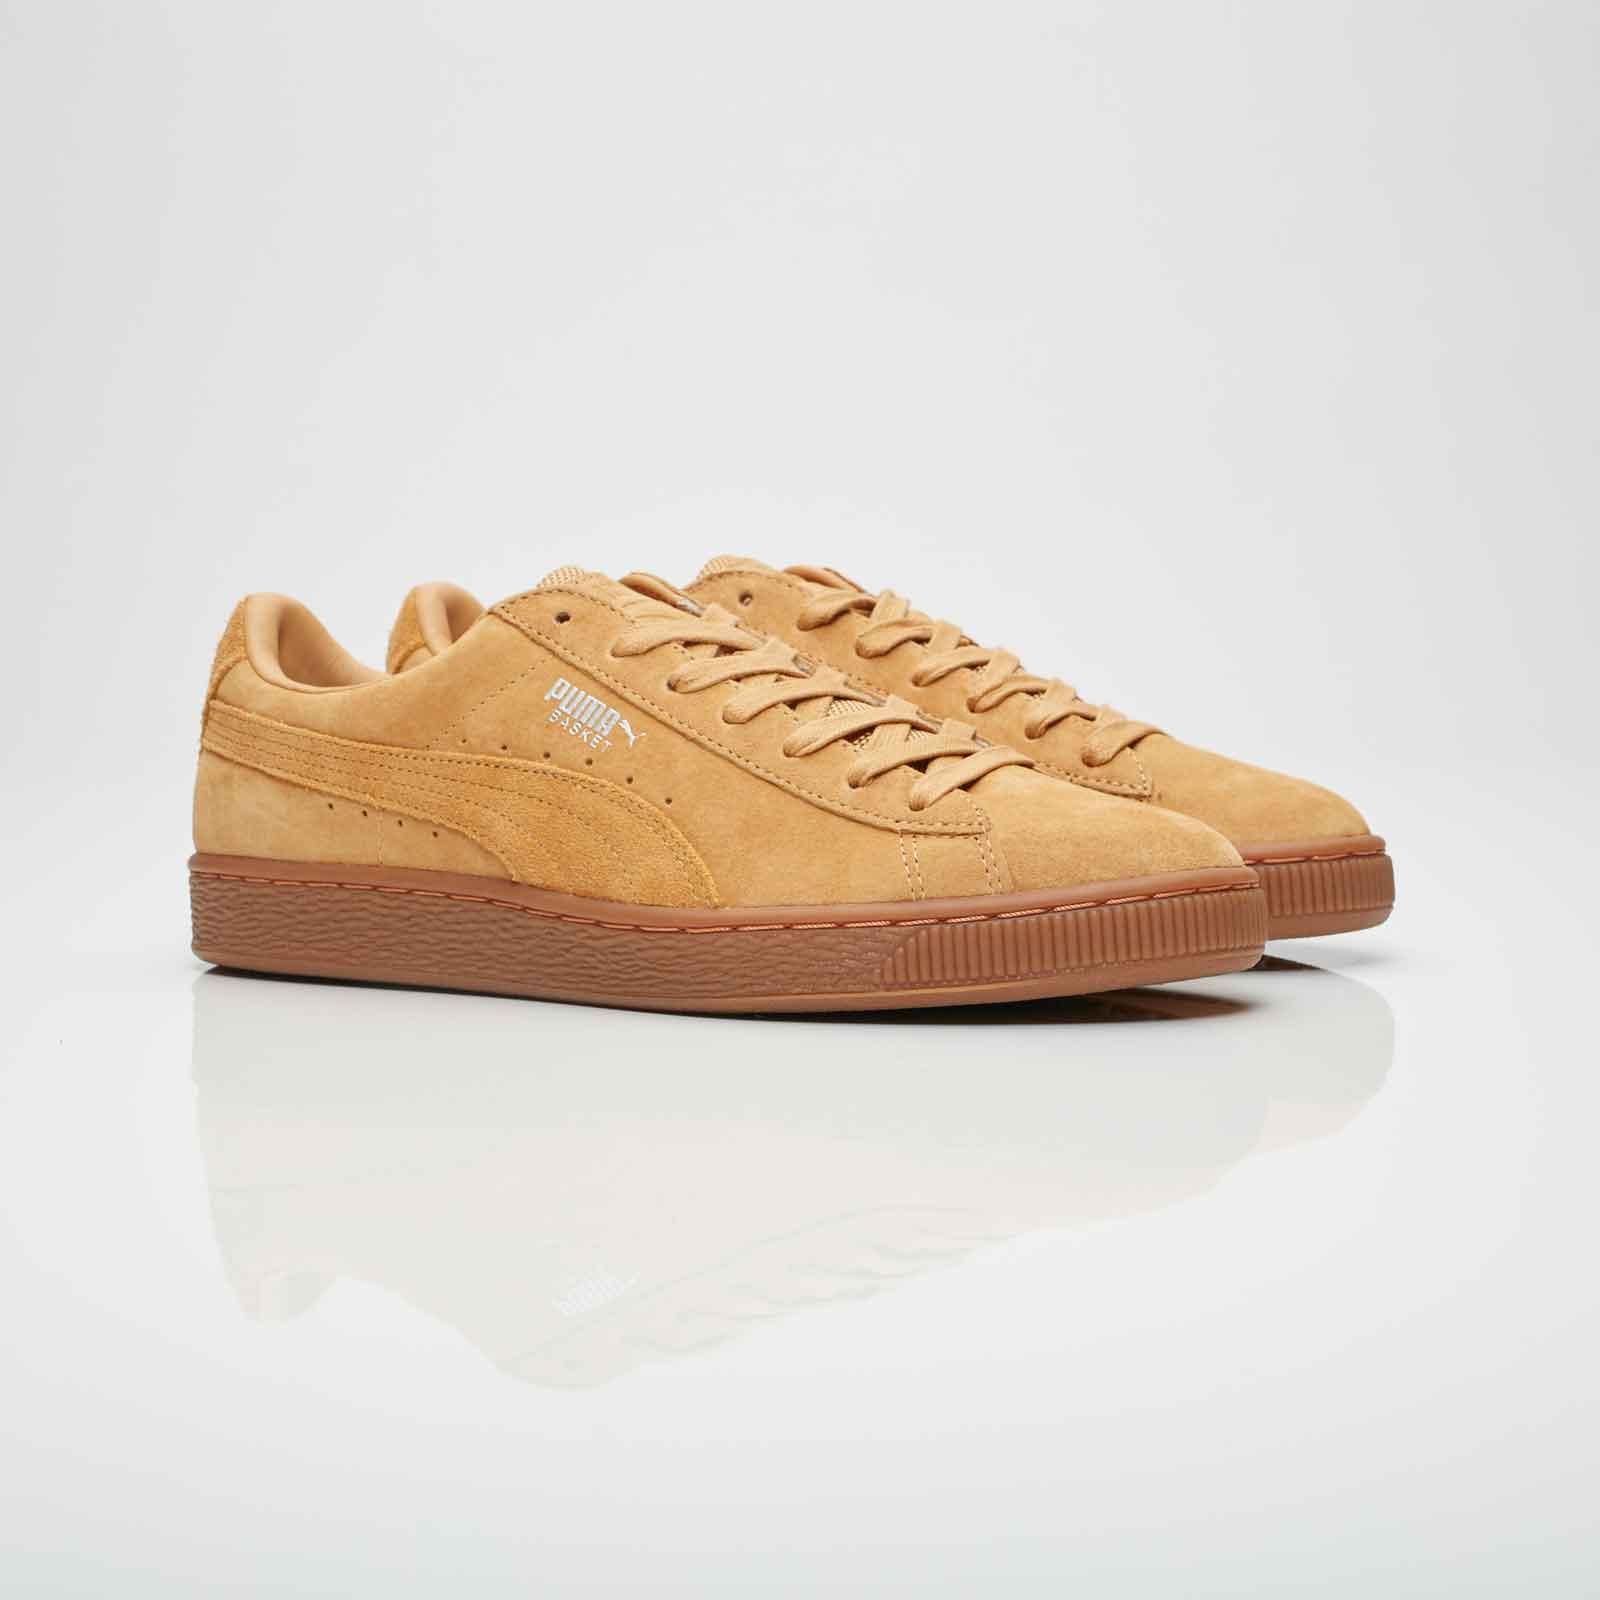 the best attitude a6912 2cfe5 Puma Basket Classic Weatherproof - 363829-02 - Sneakersnstuff ...